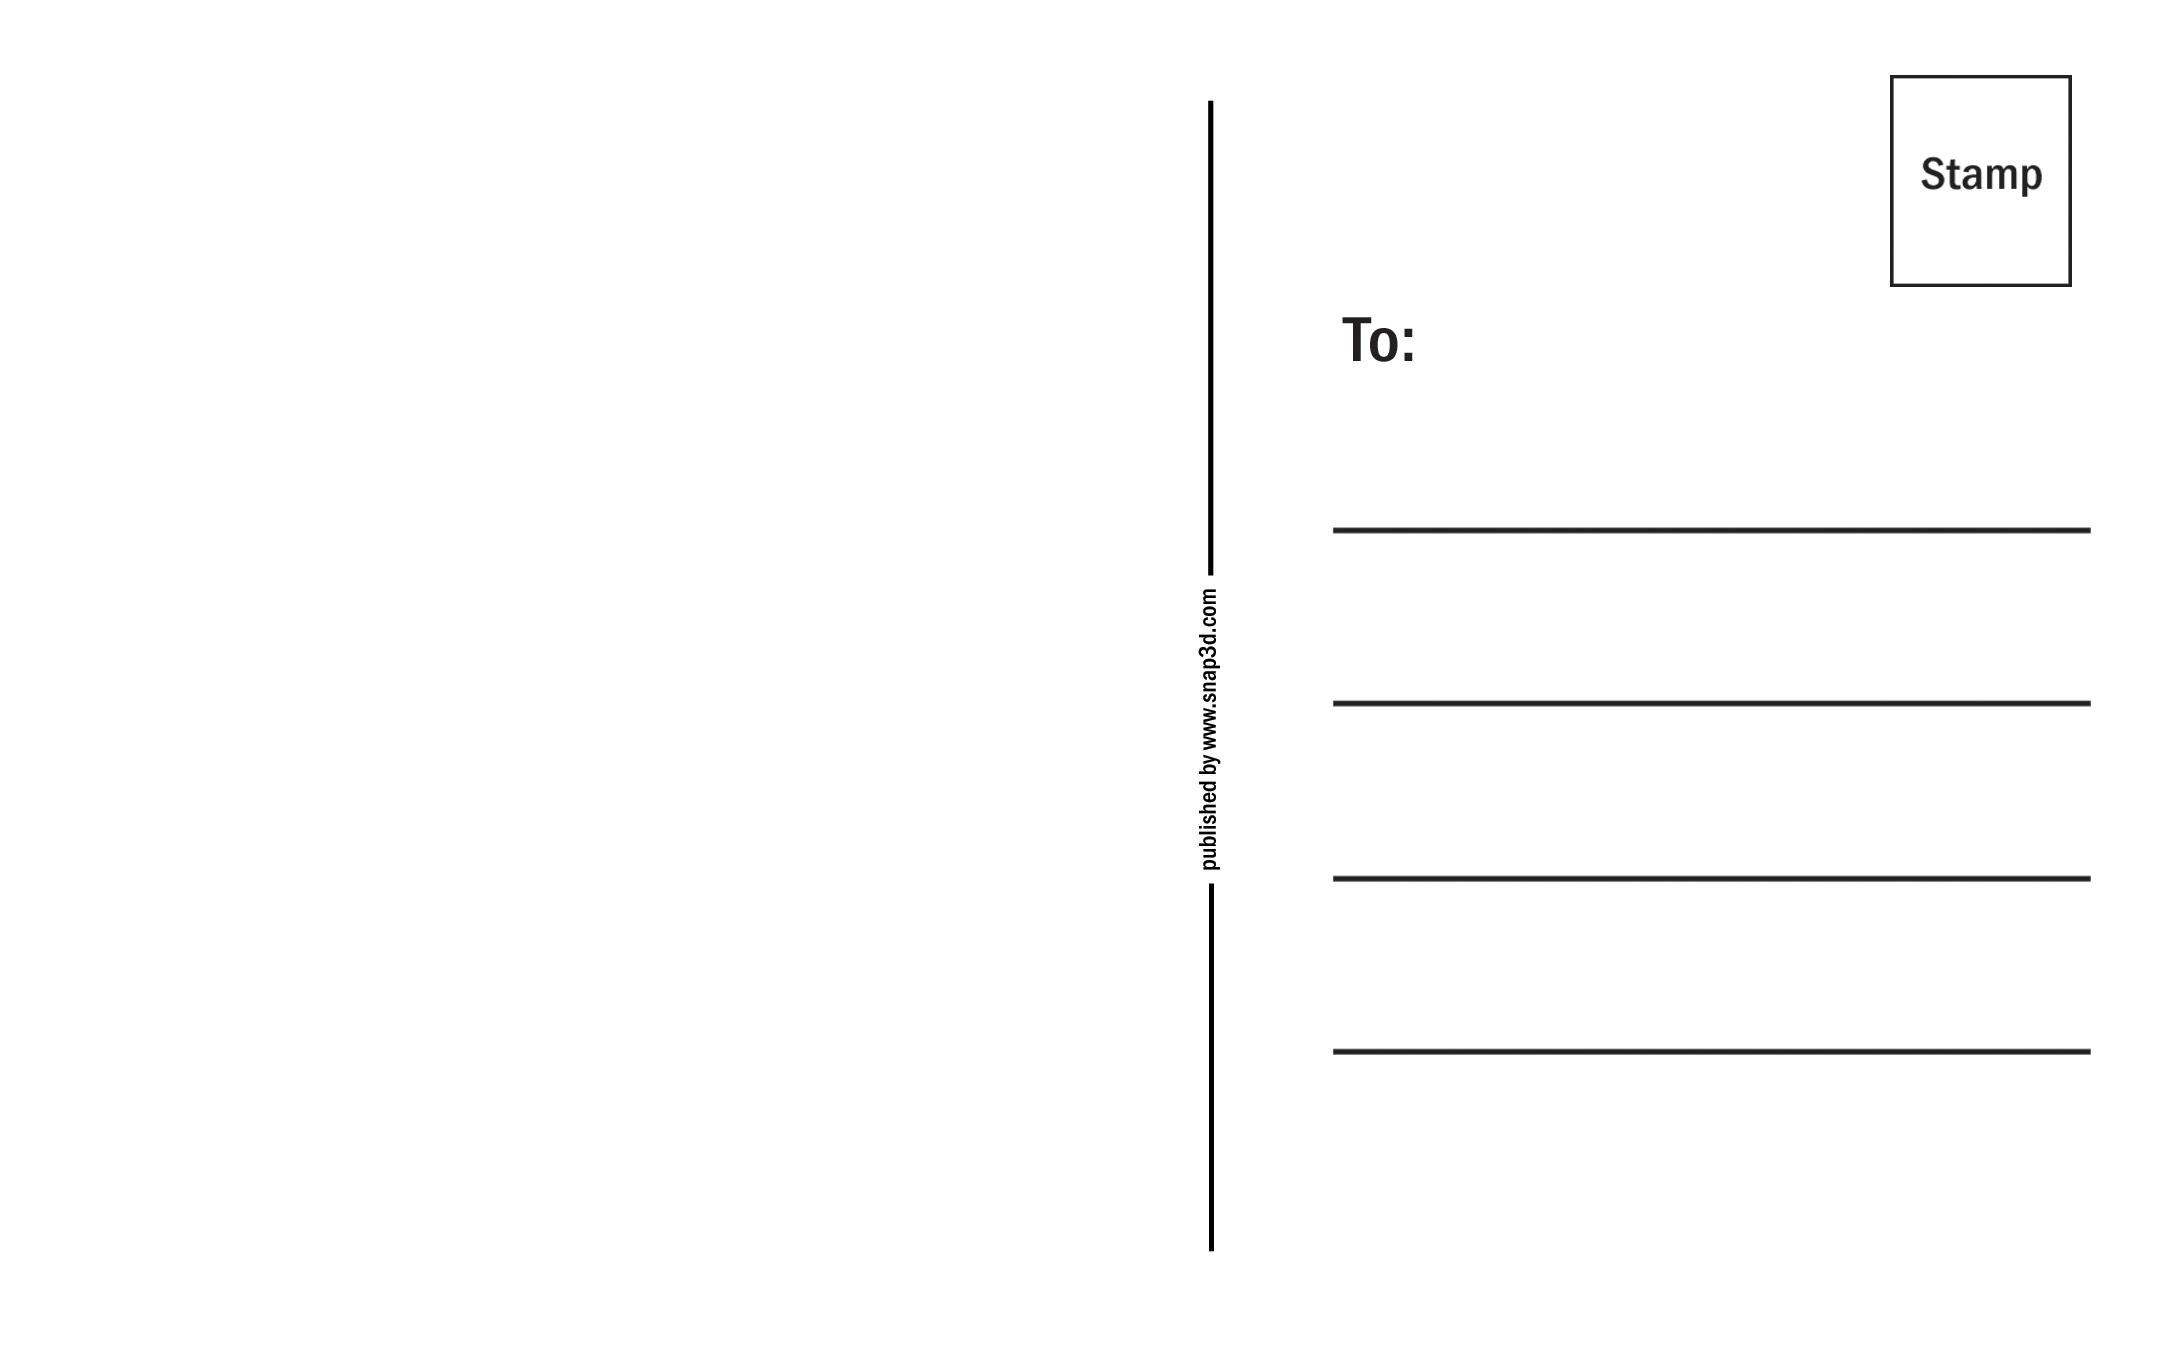 Doc Free Postcard Templates Download Blank Postcard Template – Free Postcard Templates Download